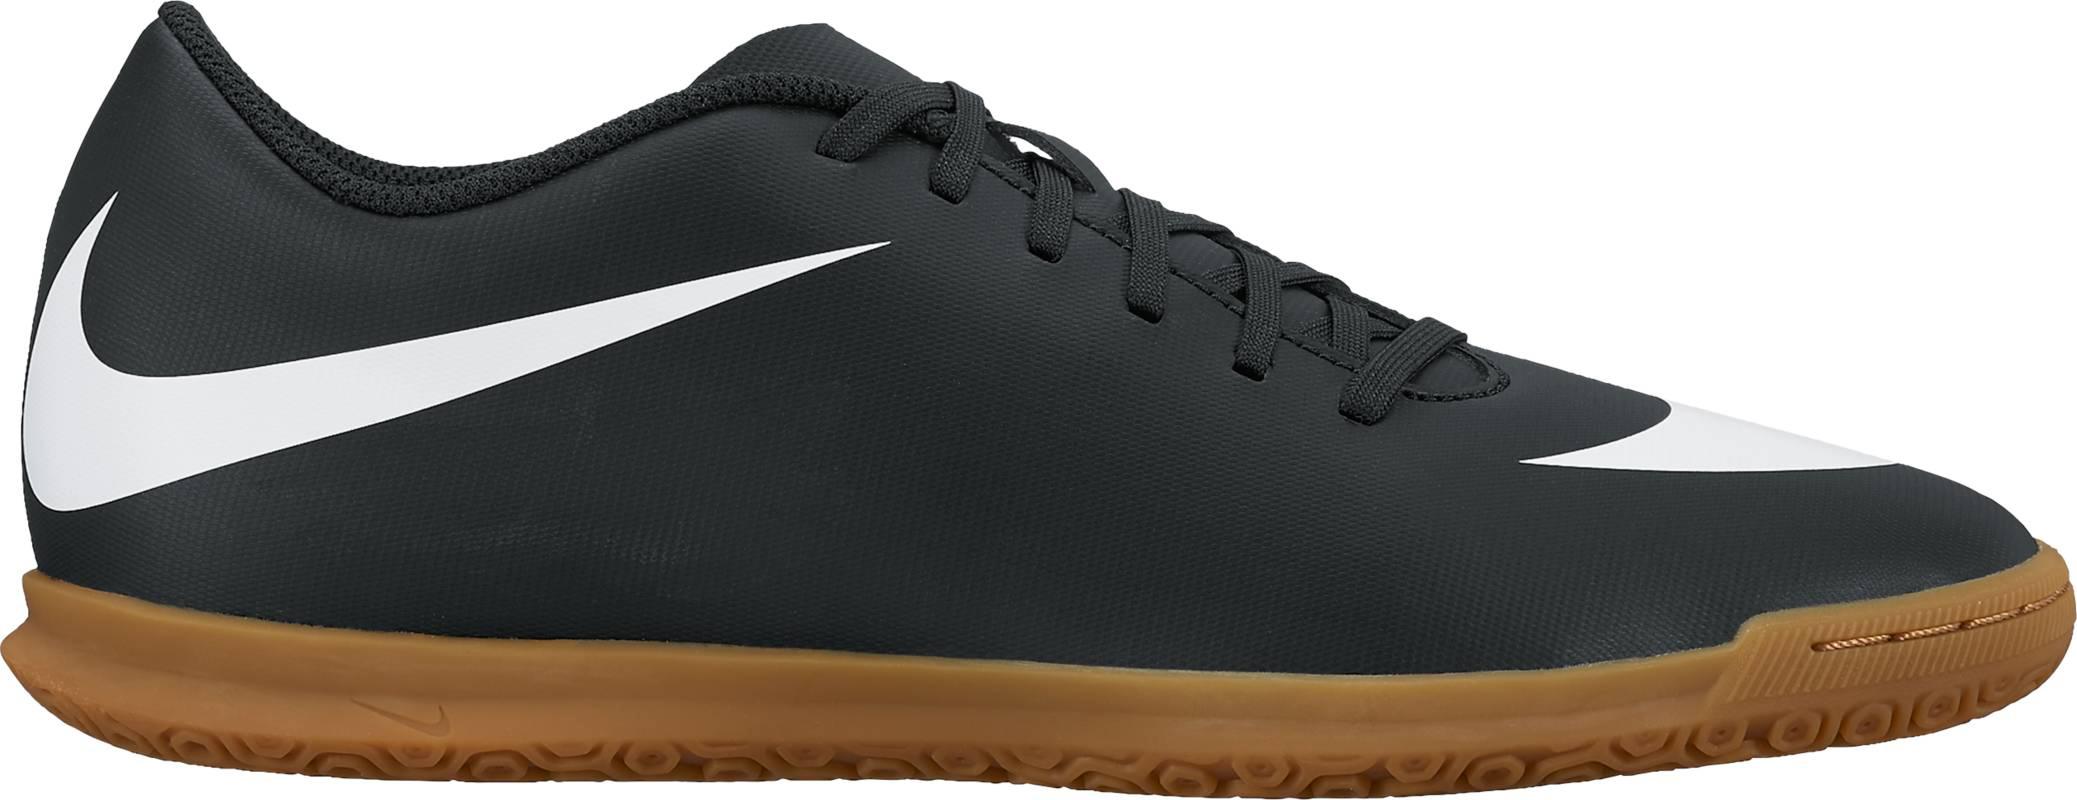 Бутсы мужские Nike Bravatax Ii Ic, цвет: черный. 844441-001. Размер 11 (44)